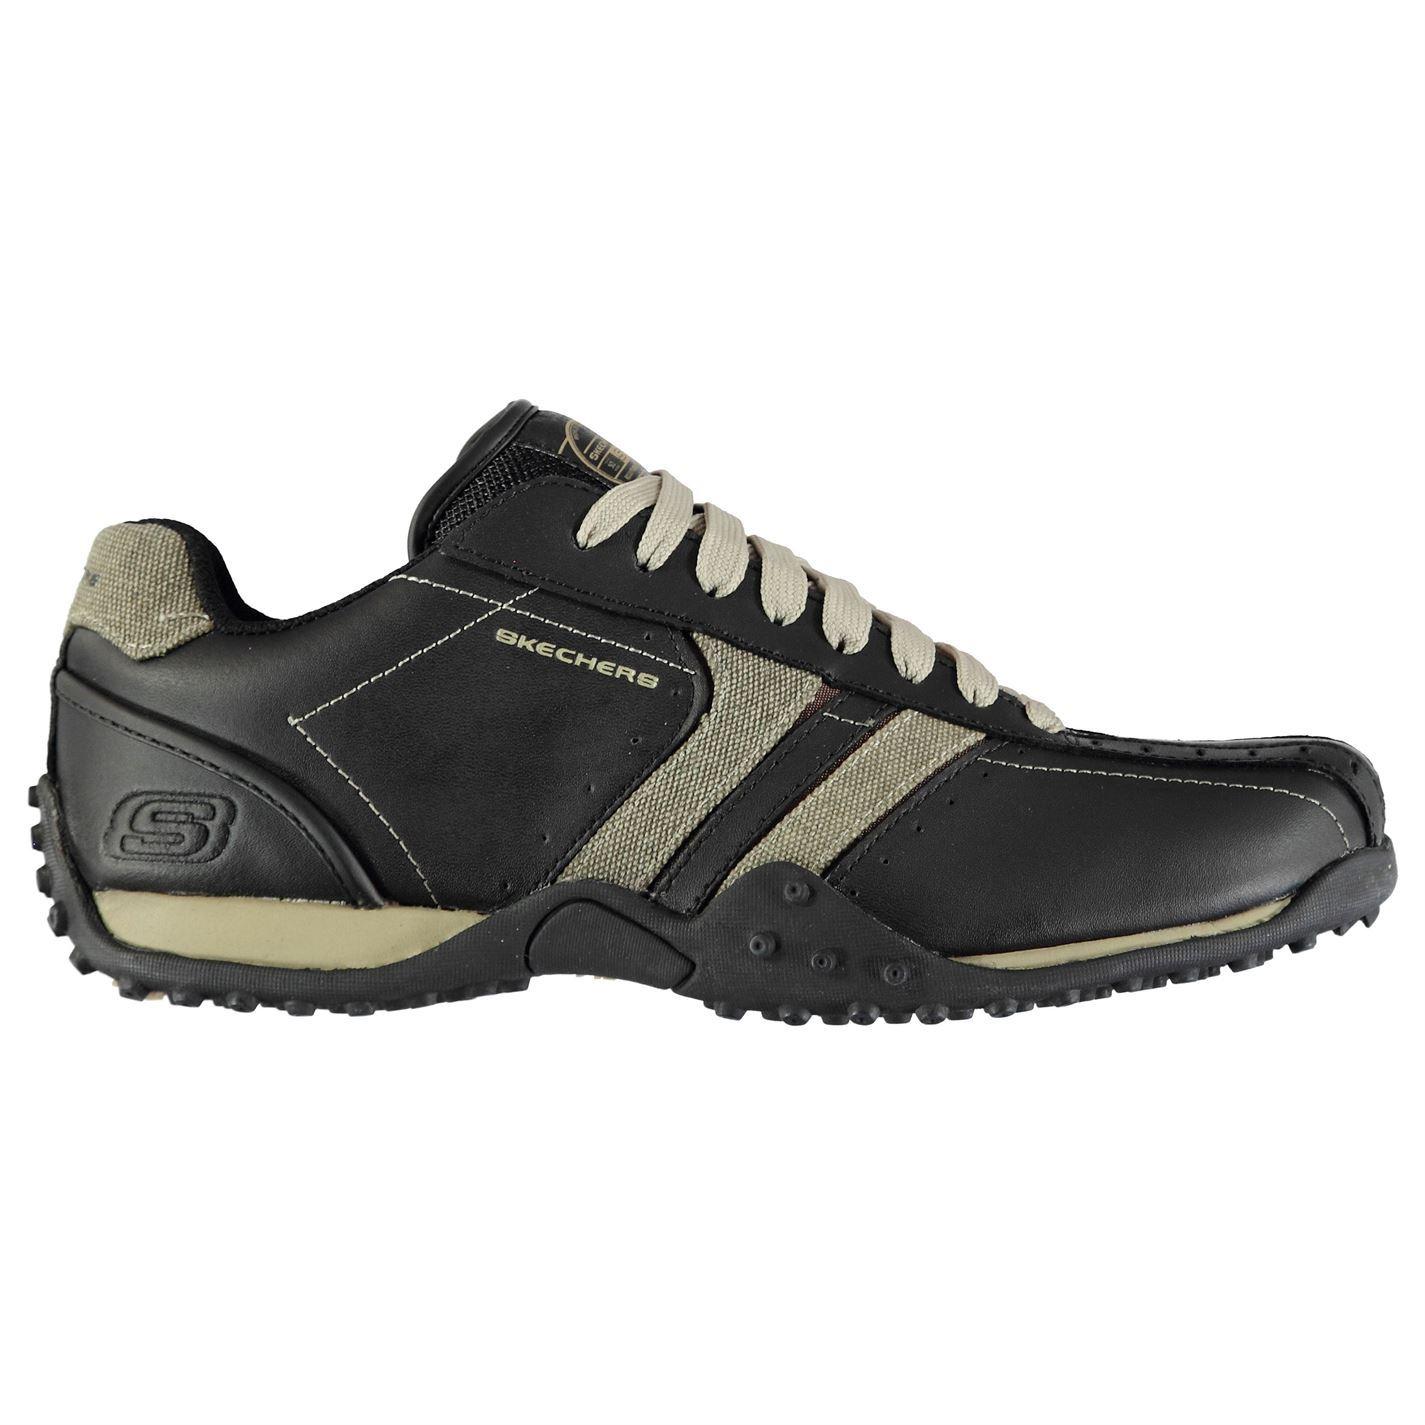 Skechers-Urban-Track-Forward-Trainers-Mens-Athleisure-Footwear-Shoes-Sneakers thumbnail 8